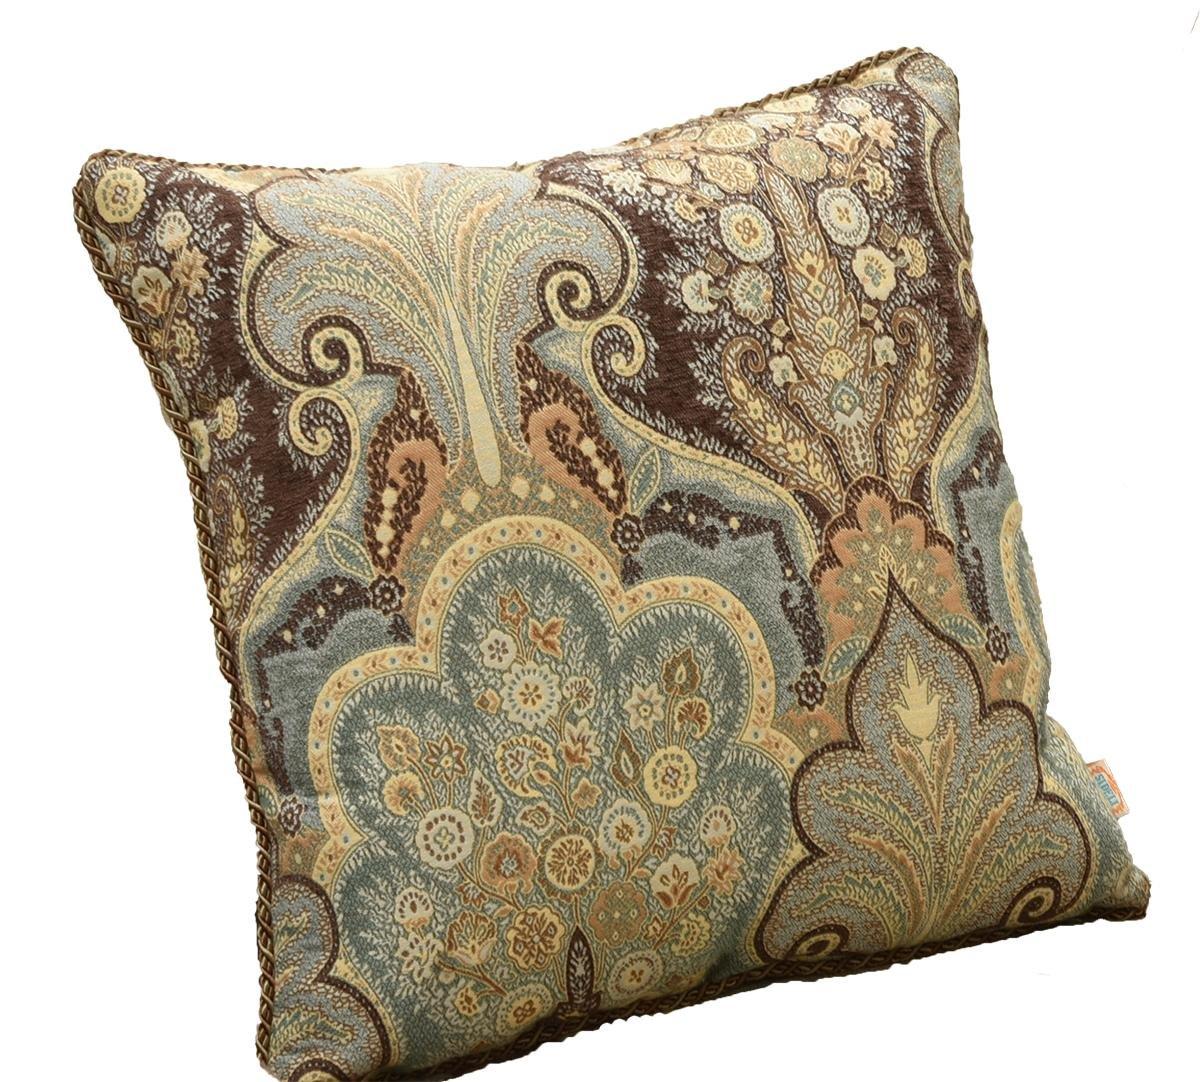 Dgreen Cushion Cover Sideli Luxury Chenille Jacquard Sofa Slipcover Anti-Slip Sectional Furniture Predector Petproof(35 x82 -Oversized Sofa, Beige)